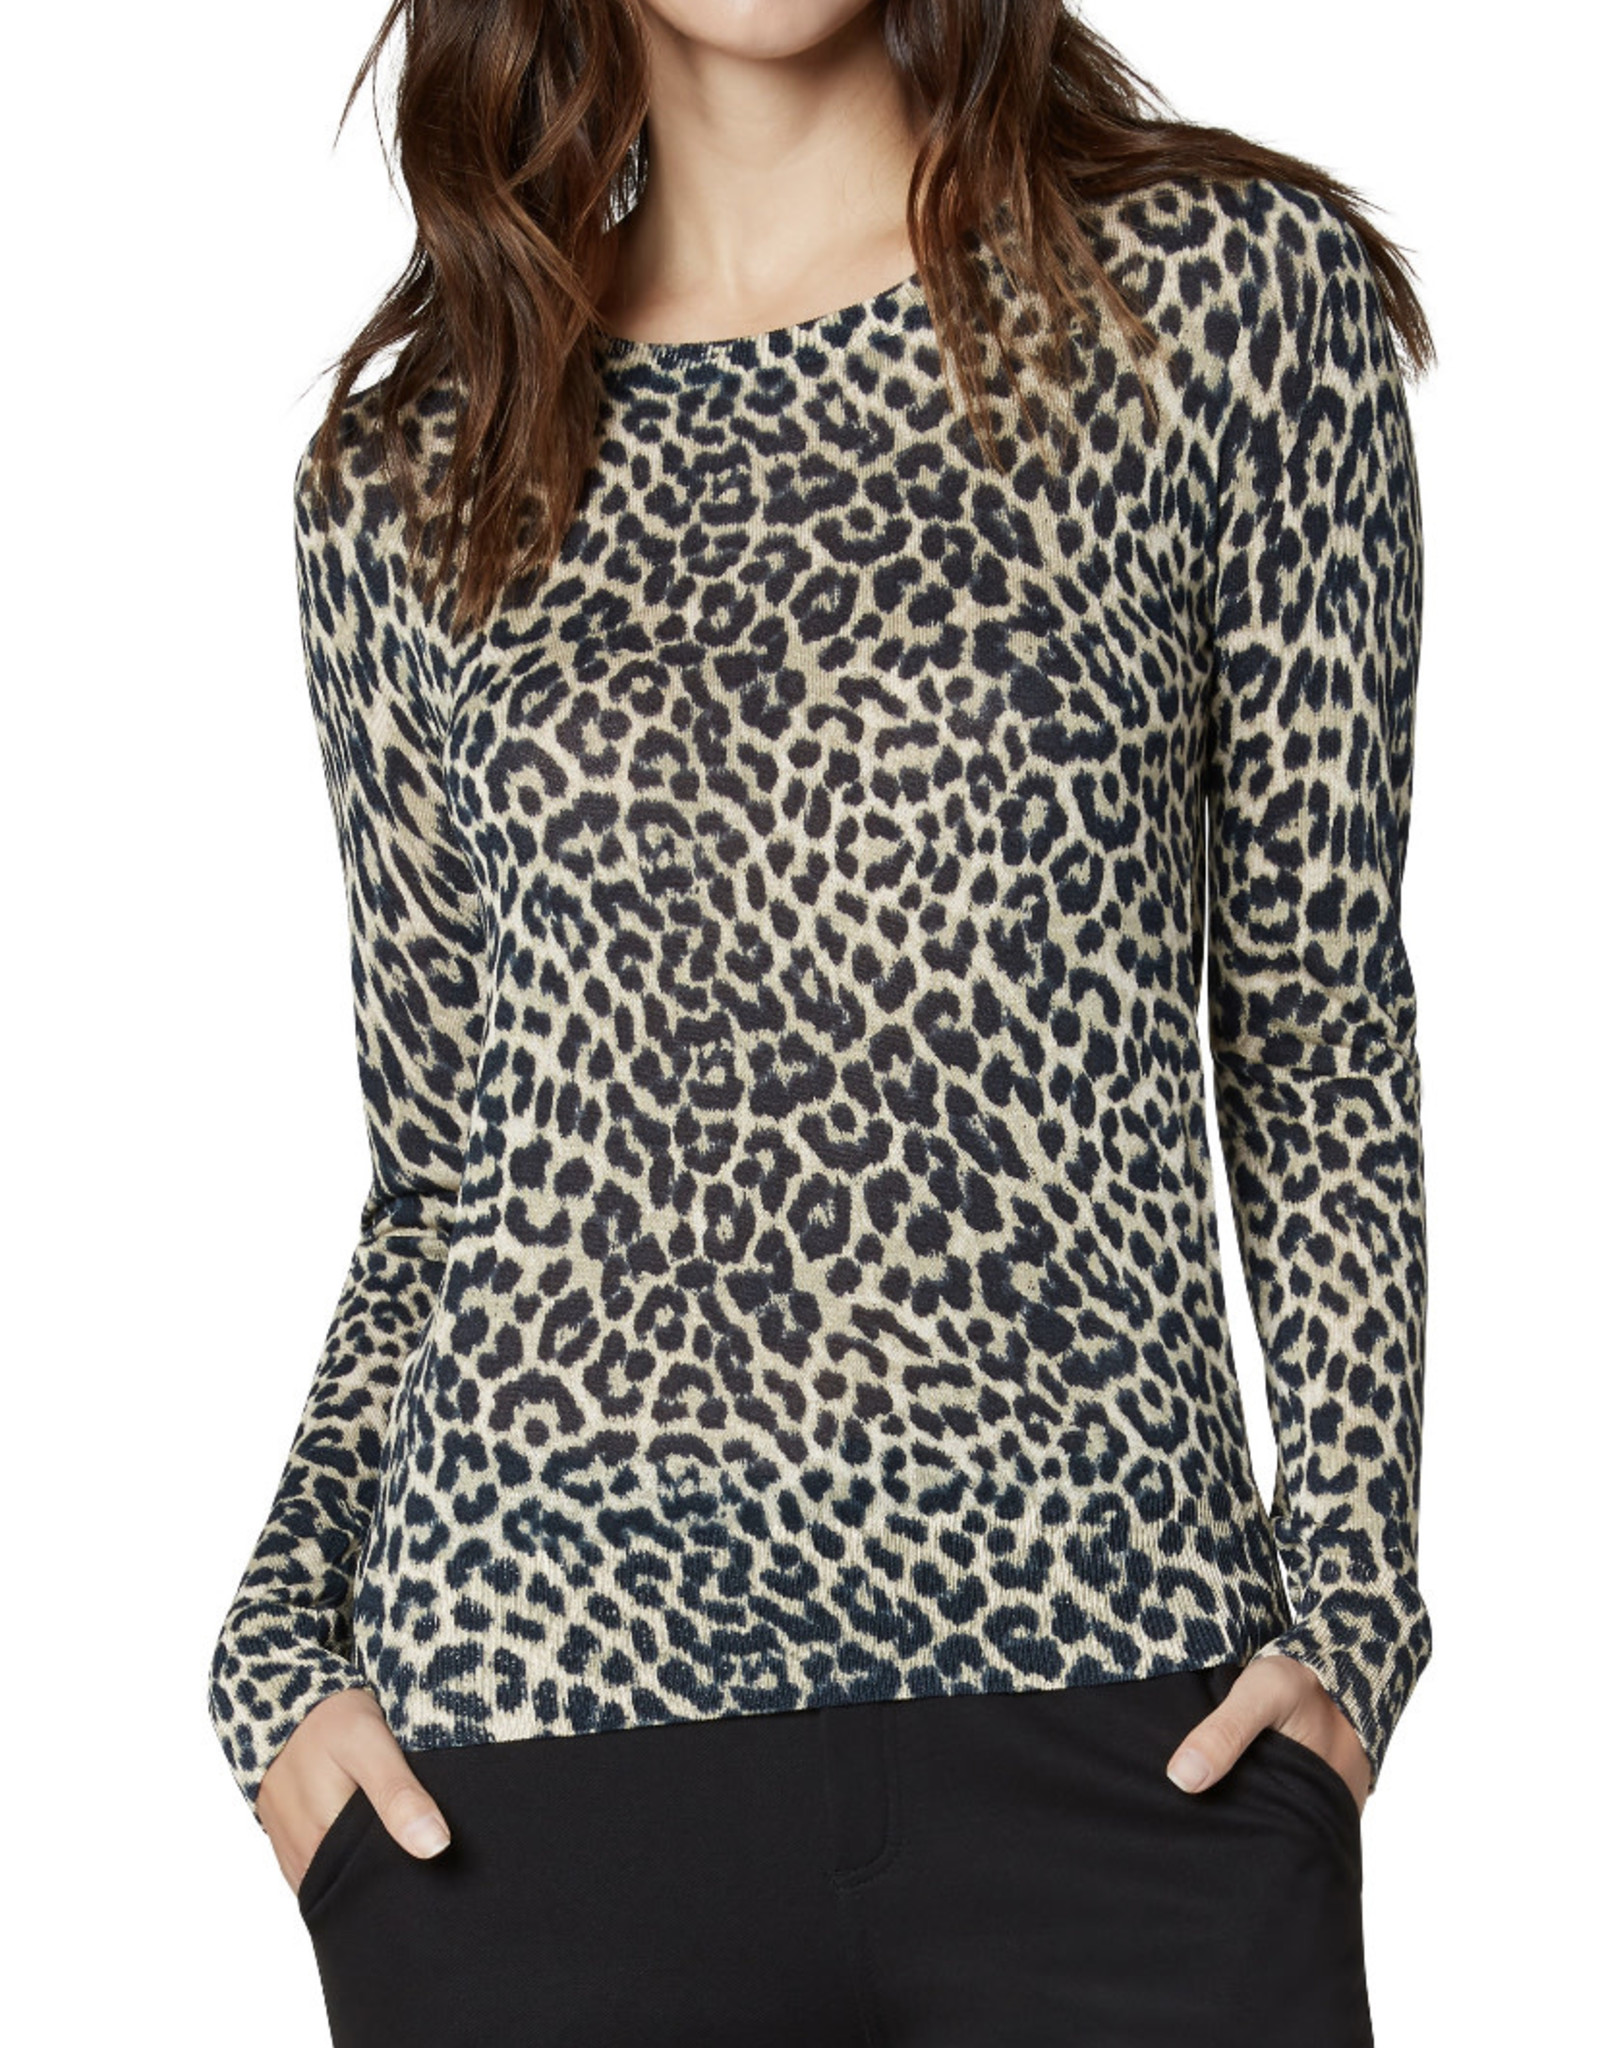 Liverpool Raglan sweater w/ side slits- black